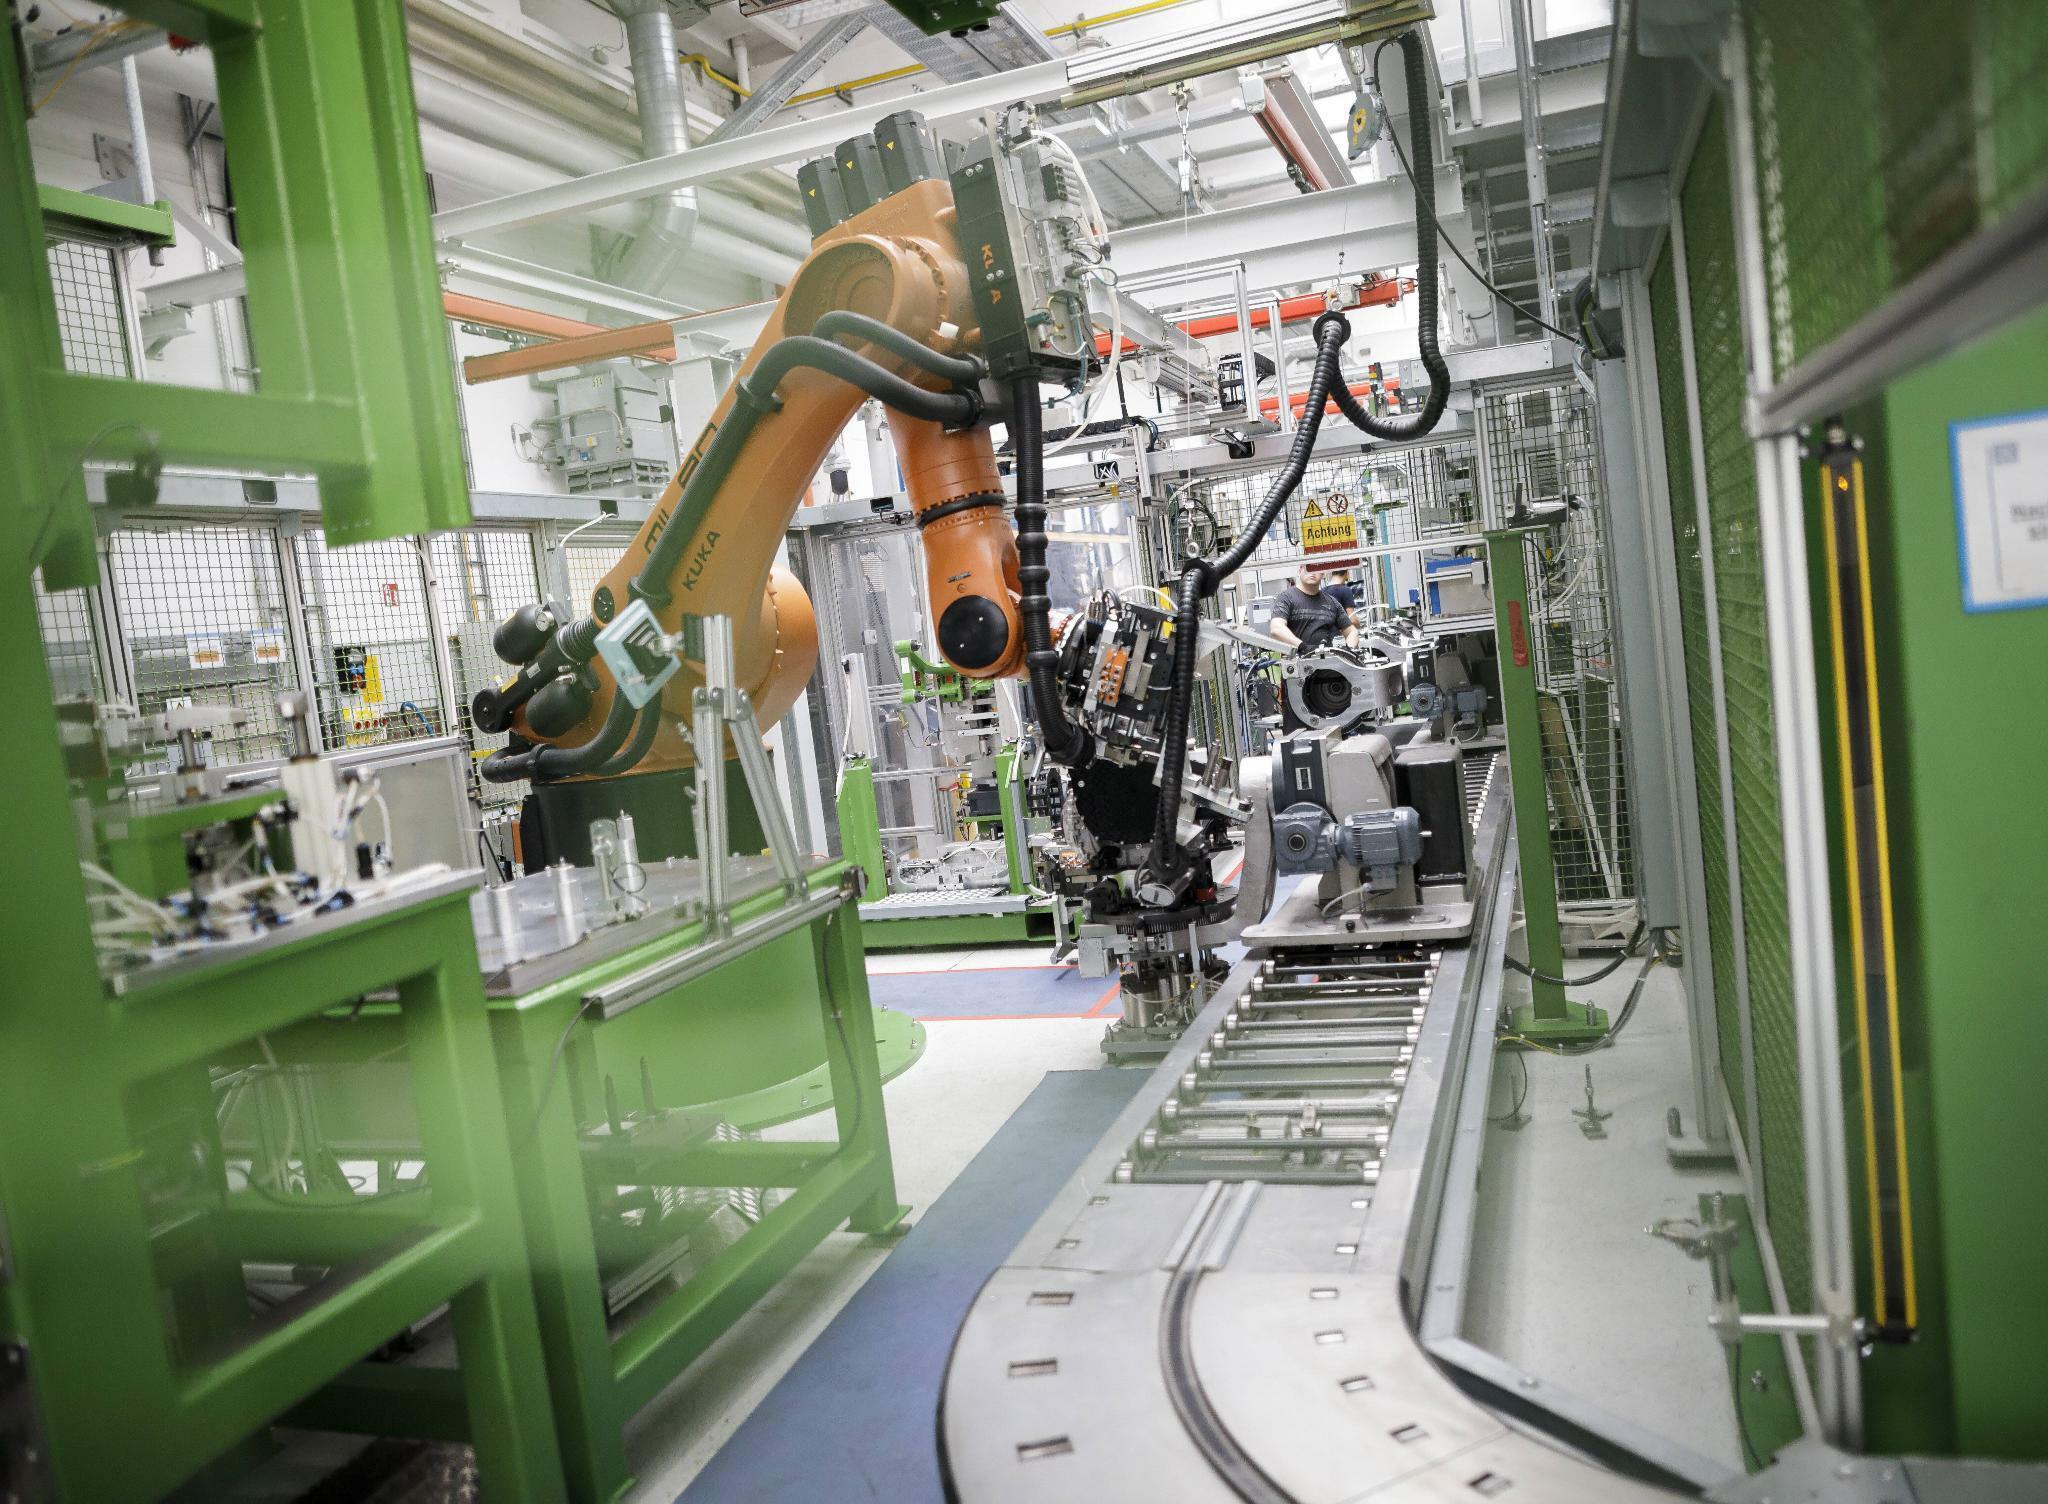 Umfrage: Technologischer Wandel beunruhigt die Deutschen